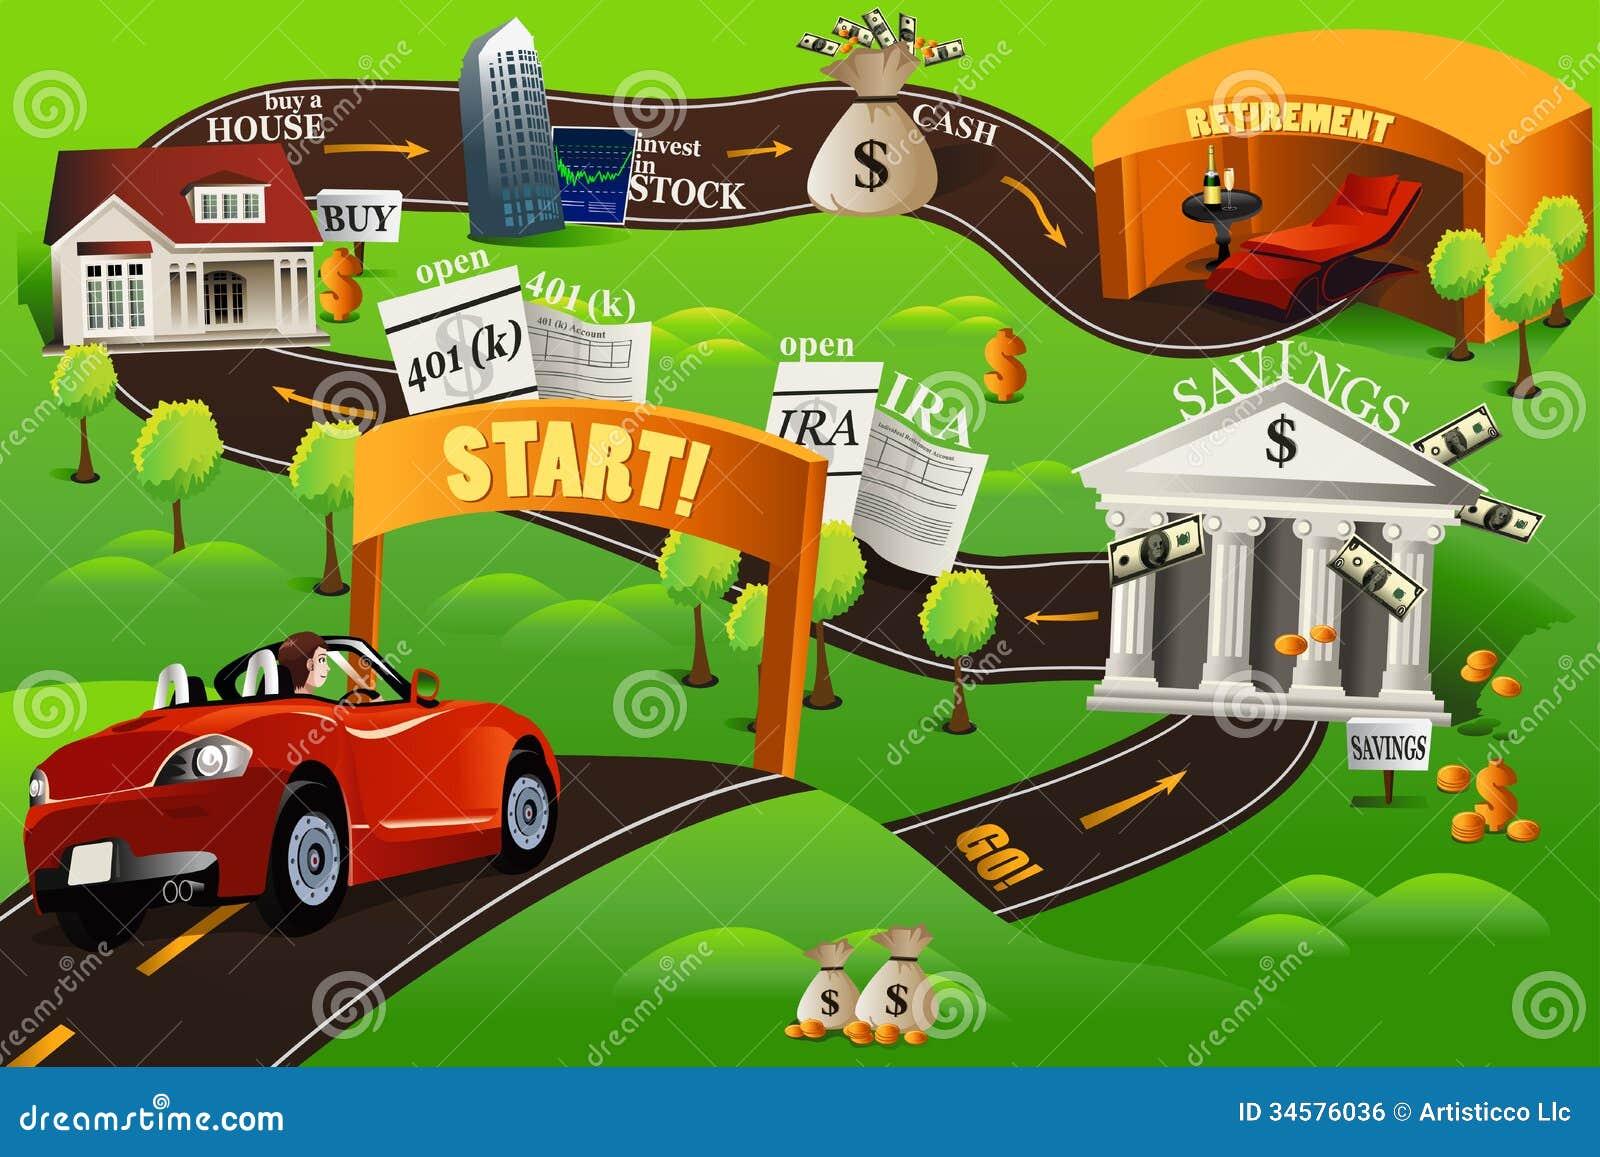 Roadmap Stock Illustrations Roadmap Stock Illustrations - Financial roadmap template